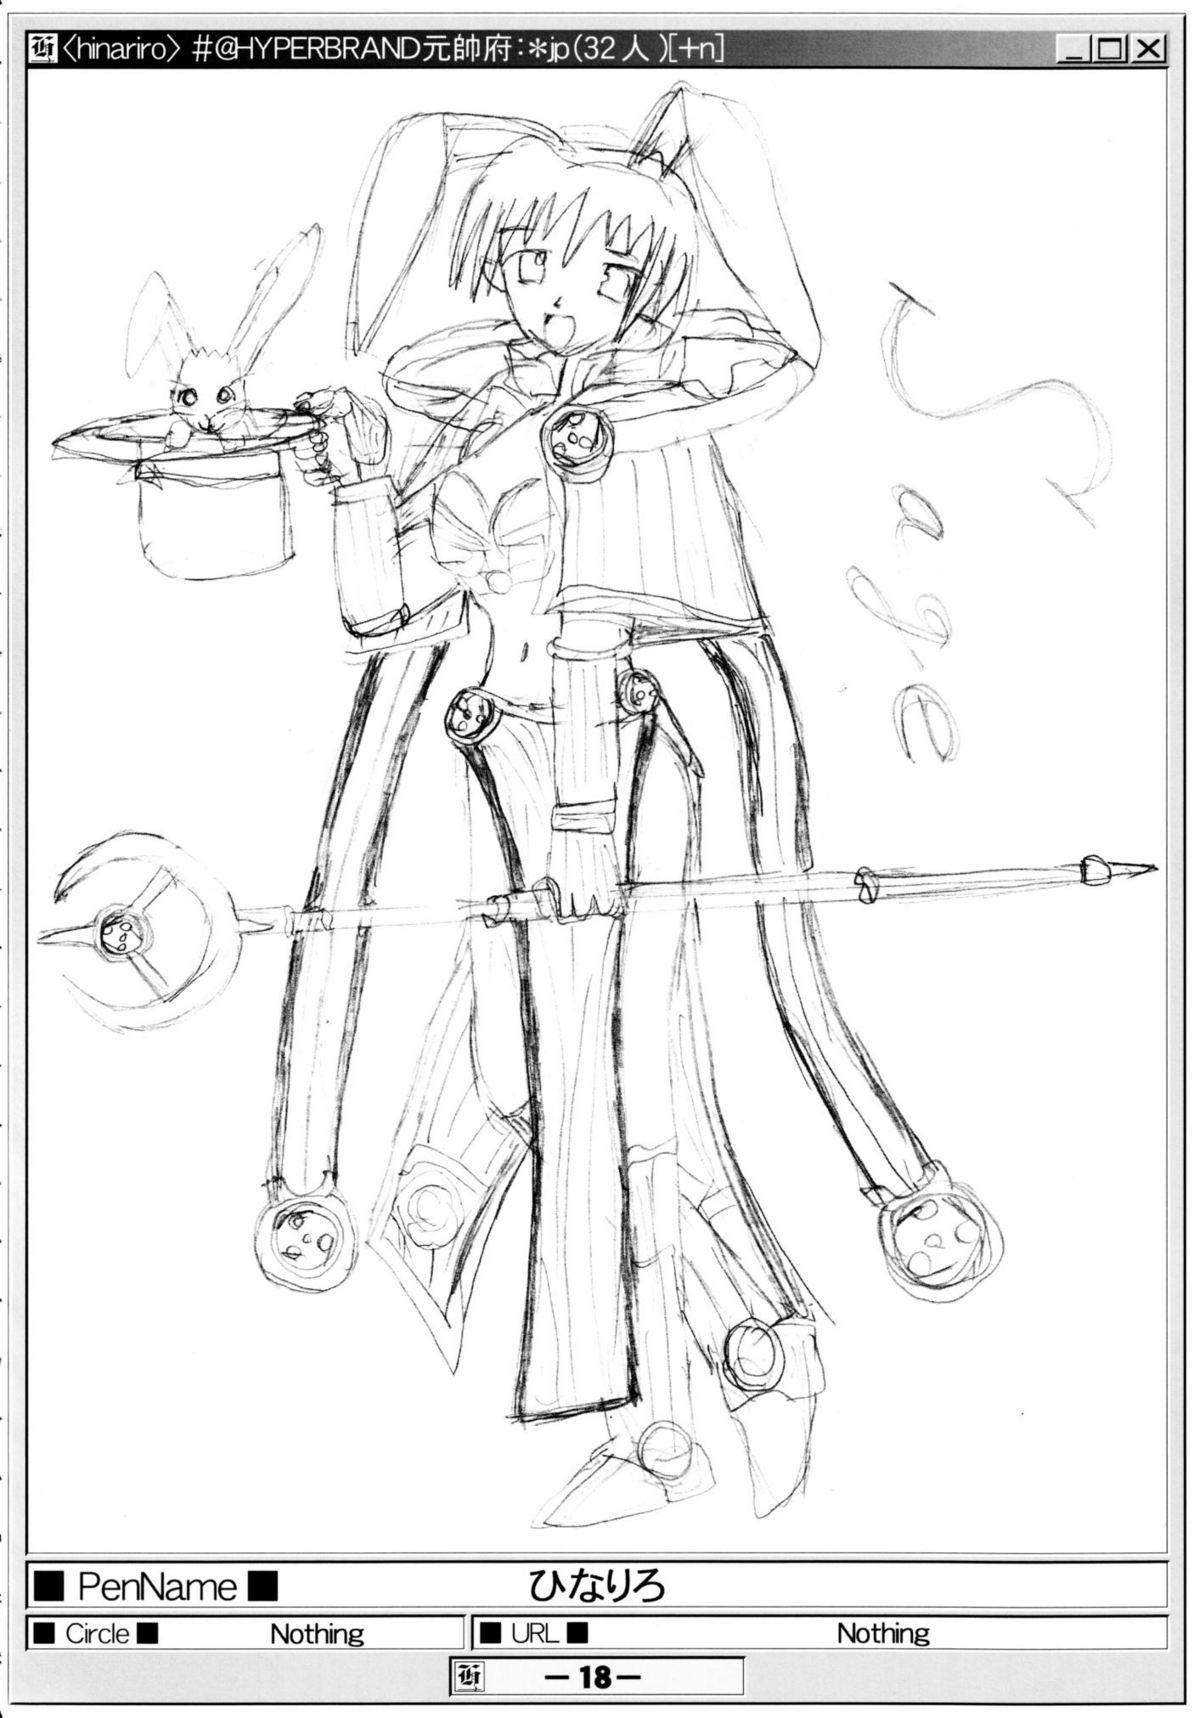 (Puniket 07) [HYPER BRAND (Deden, Ishihara Masumi, Kawamura Yasuhito)]  (Ragnarok Online) 16